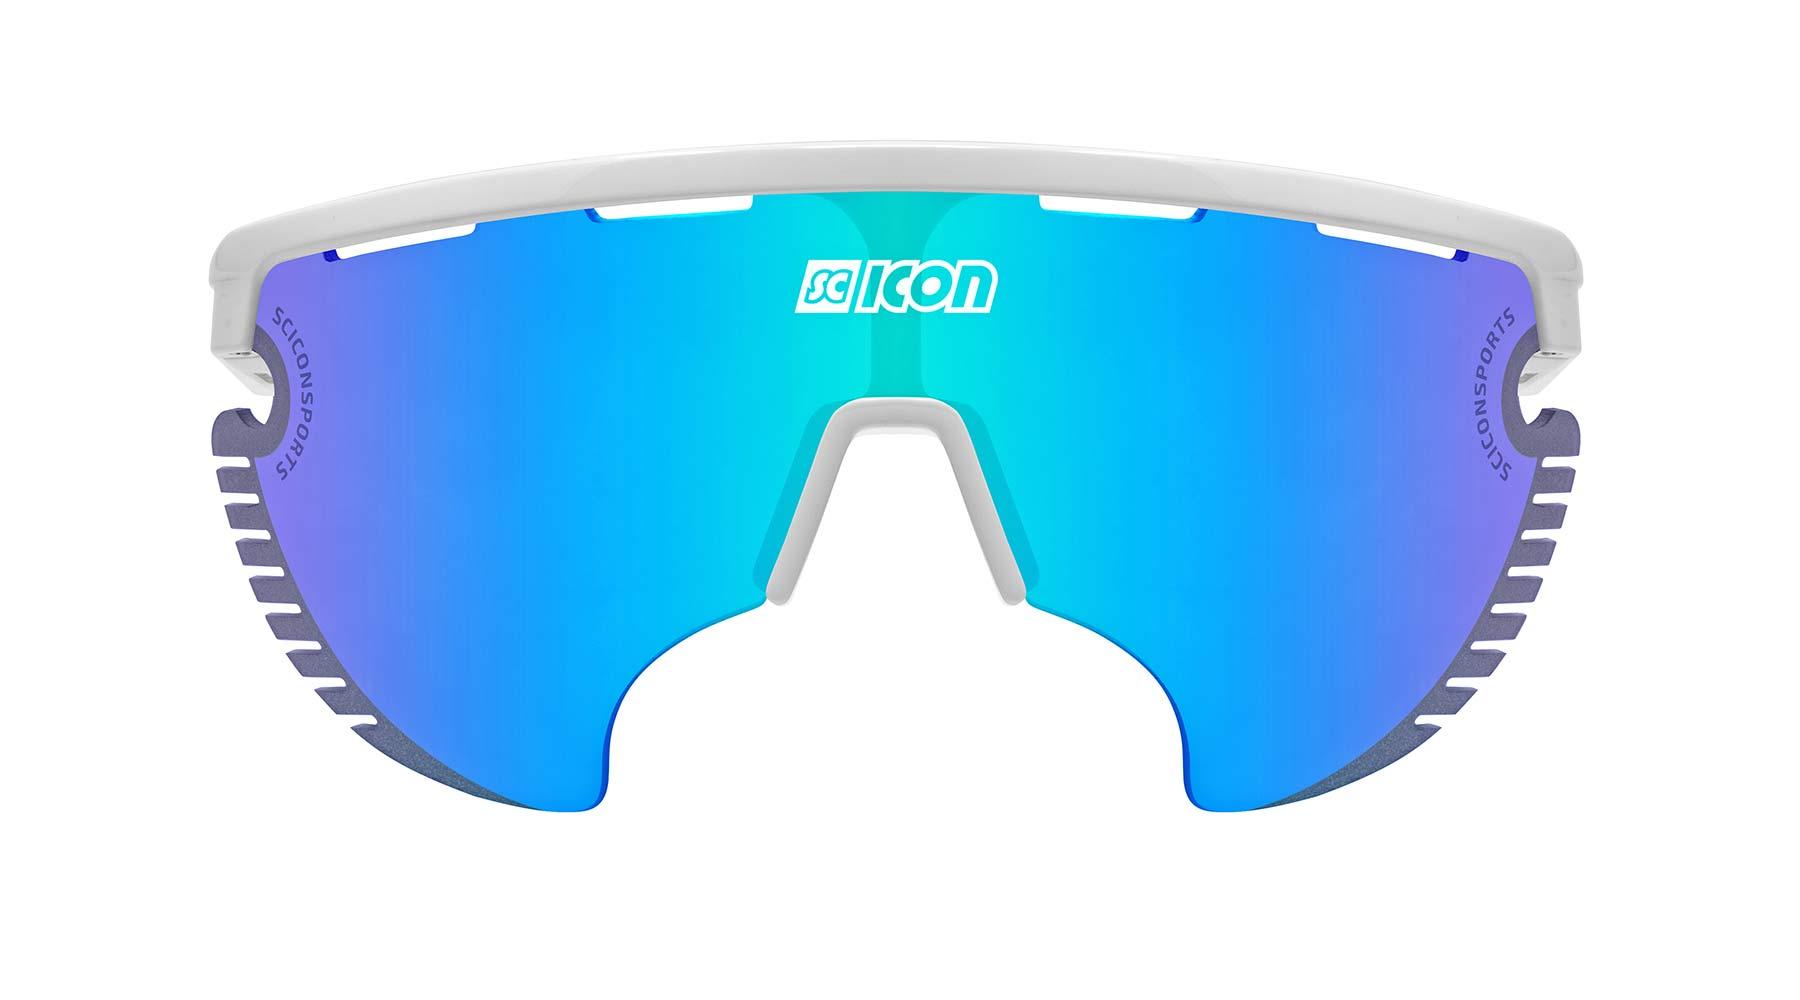 Scicon AeroWing Lamon sunglasses, blue lens front